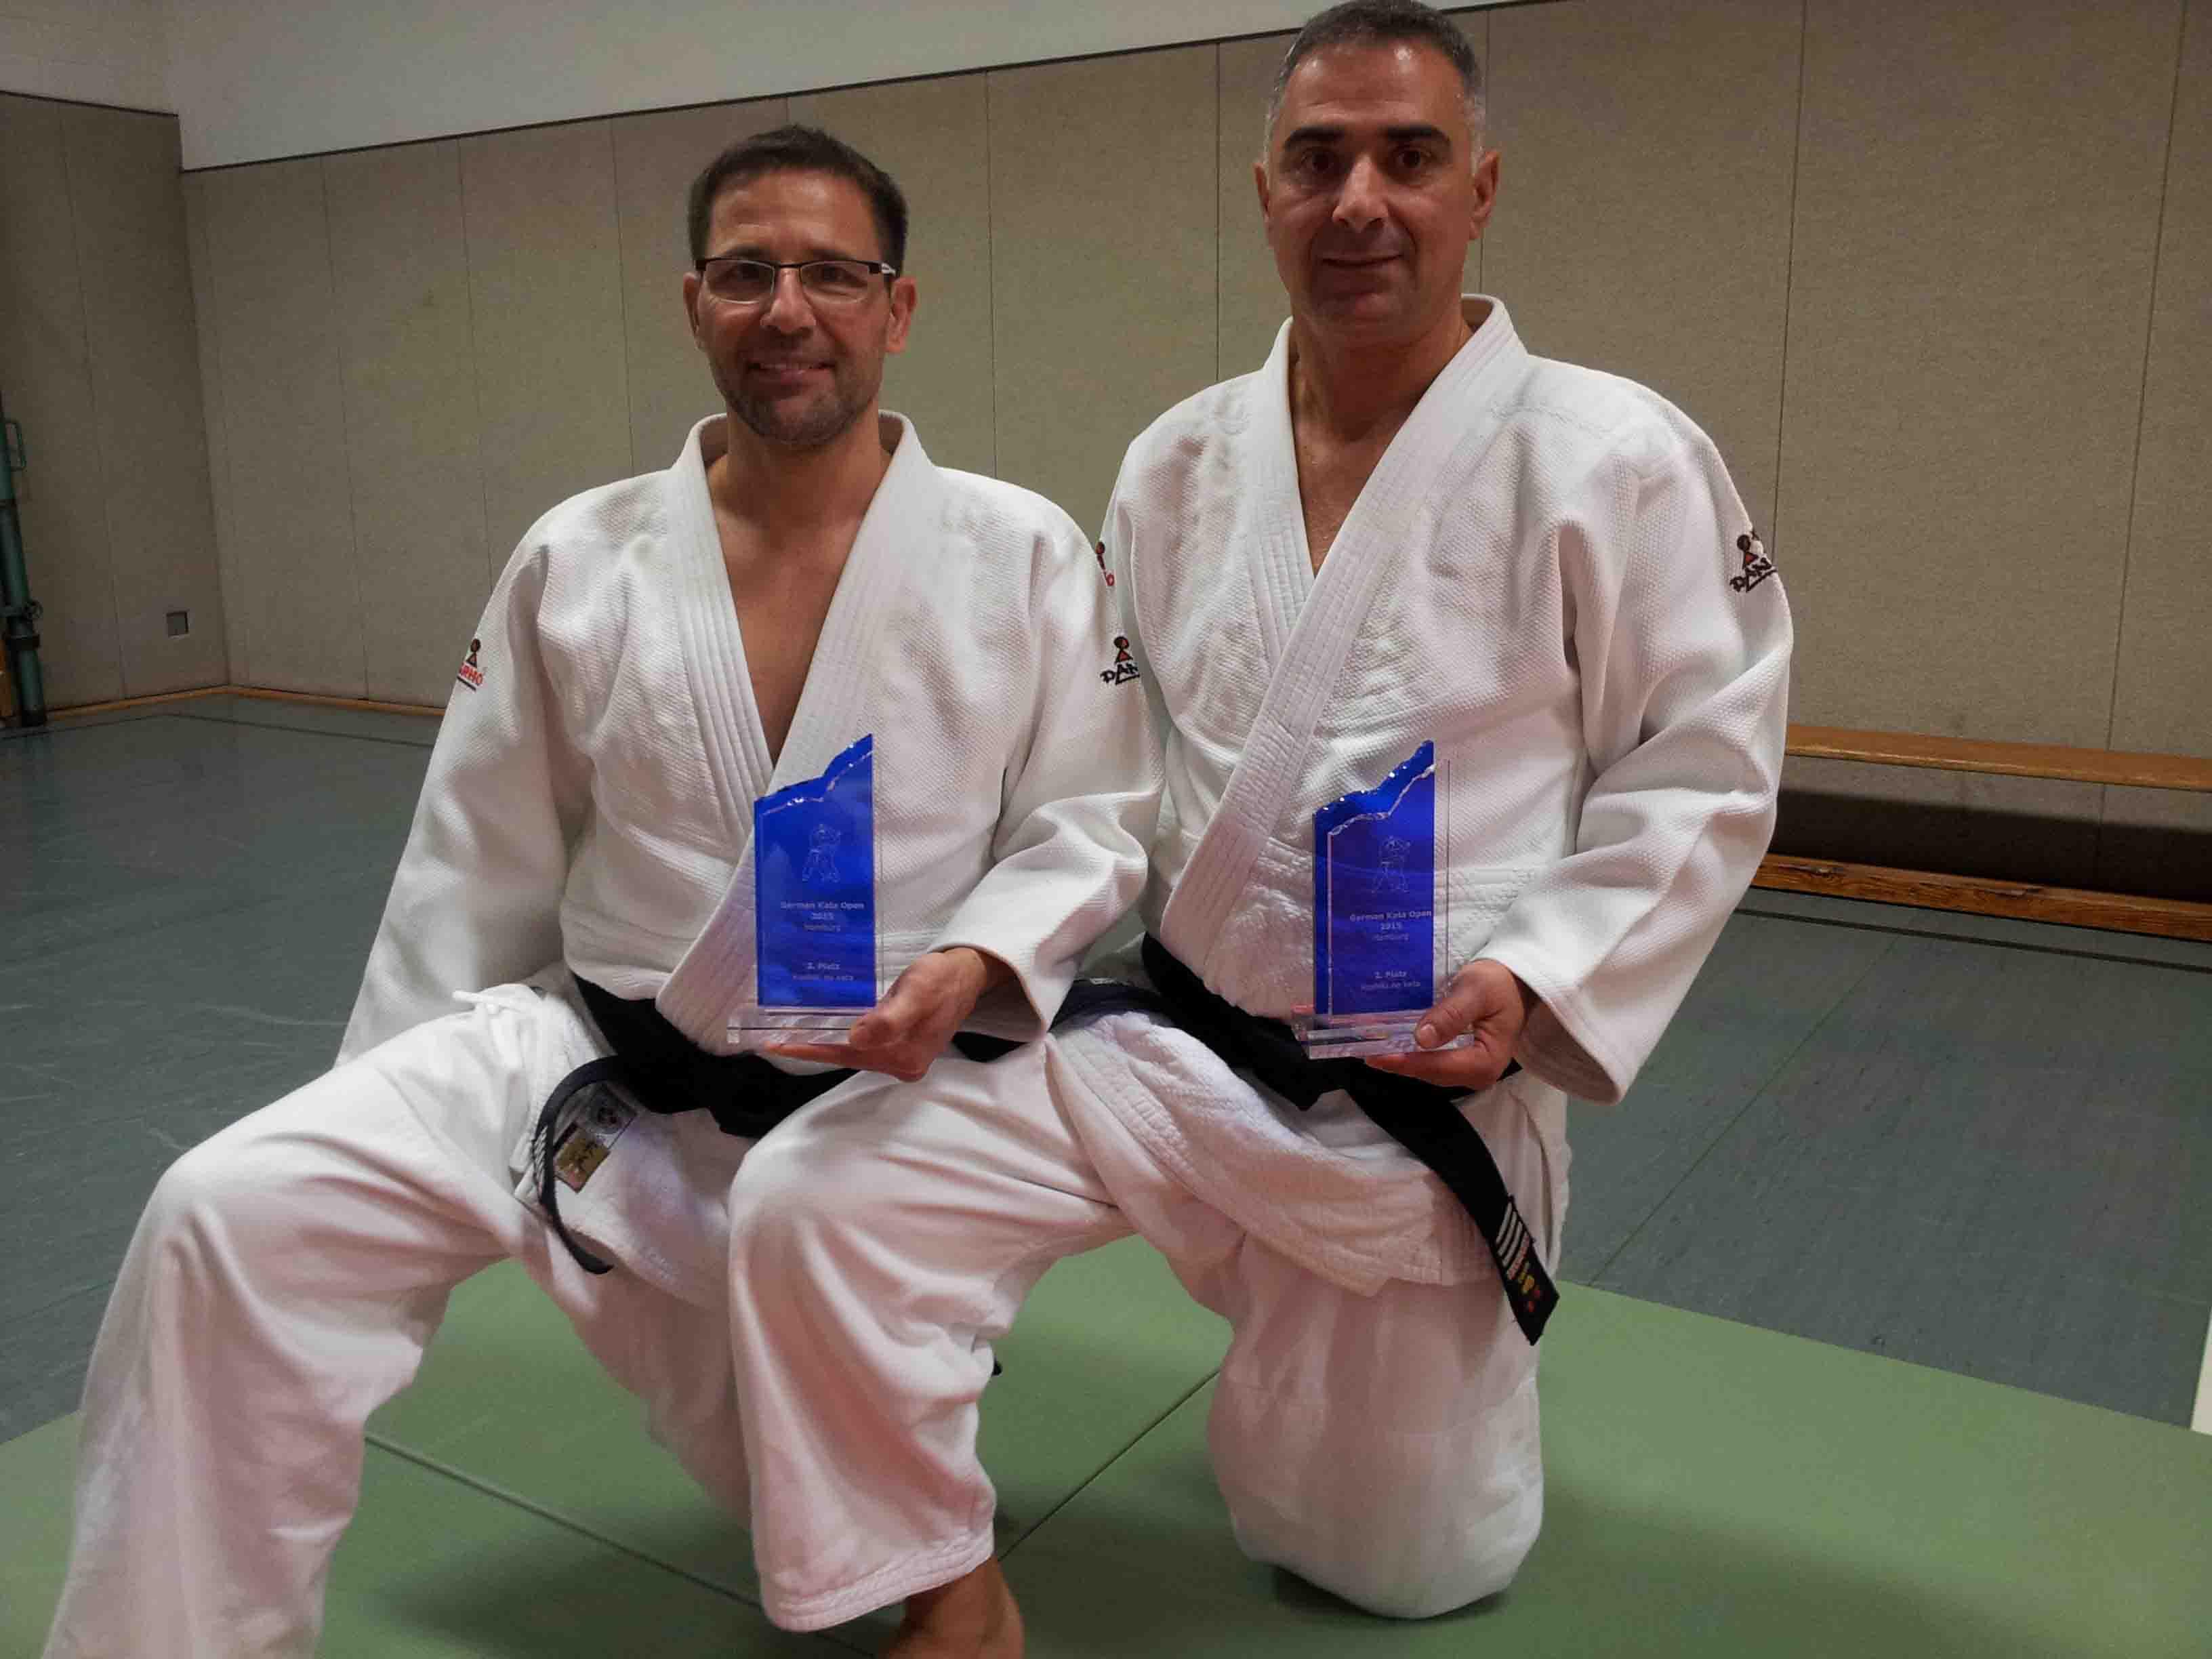 JSV Sportler bei internationaler Kata-Meisterschaft erfolgreich